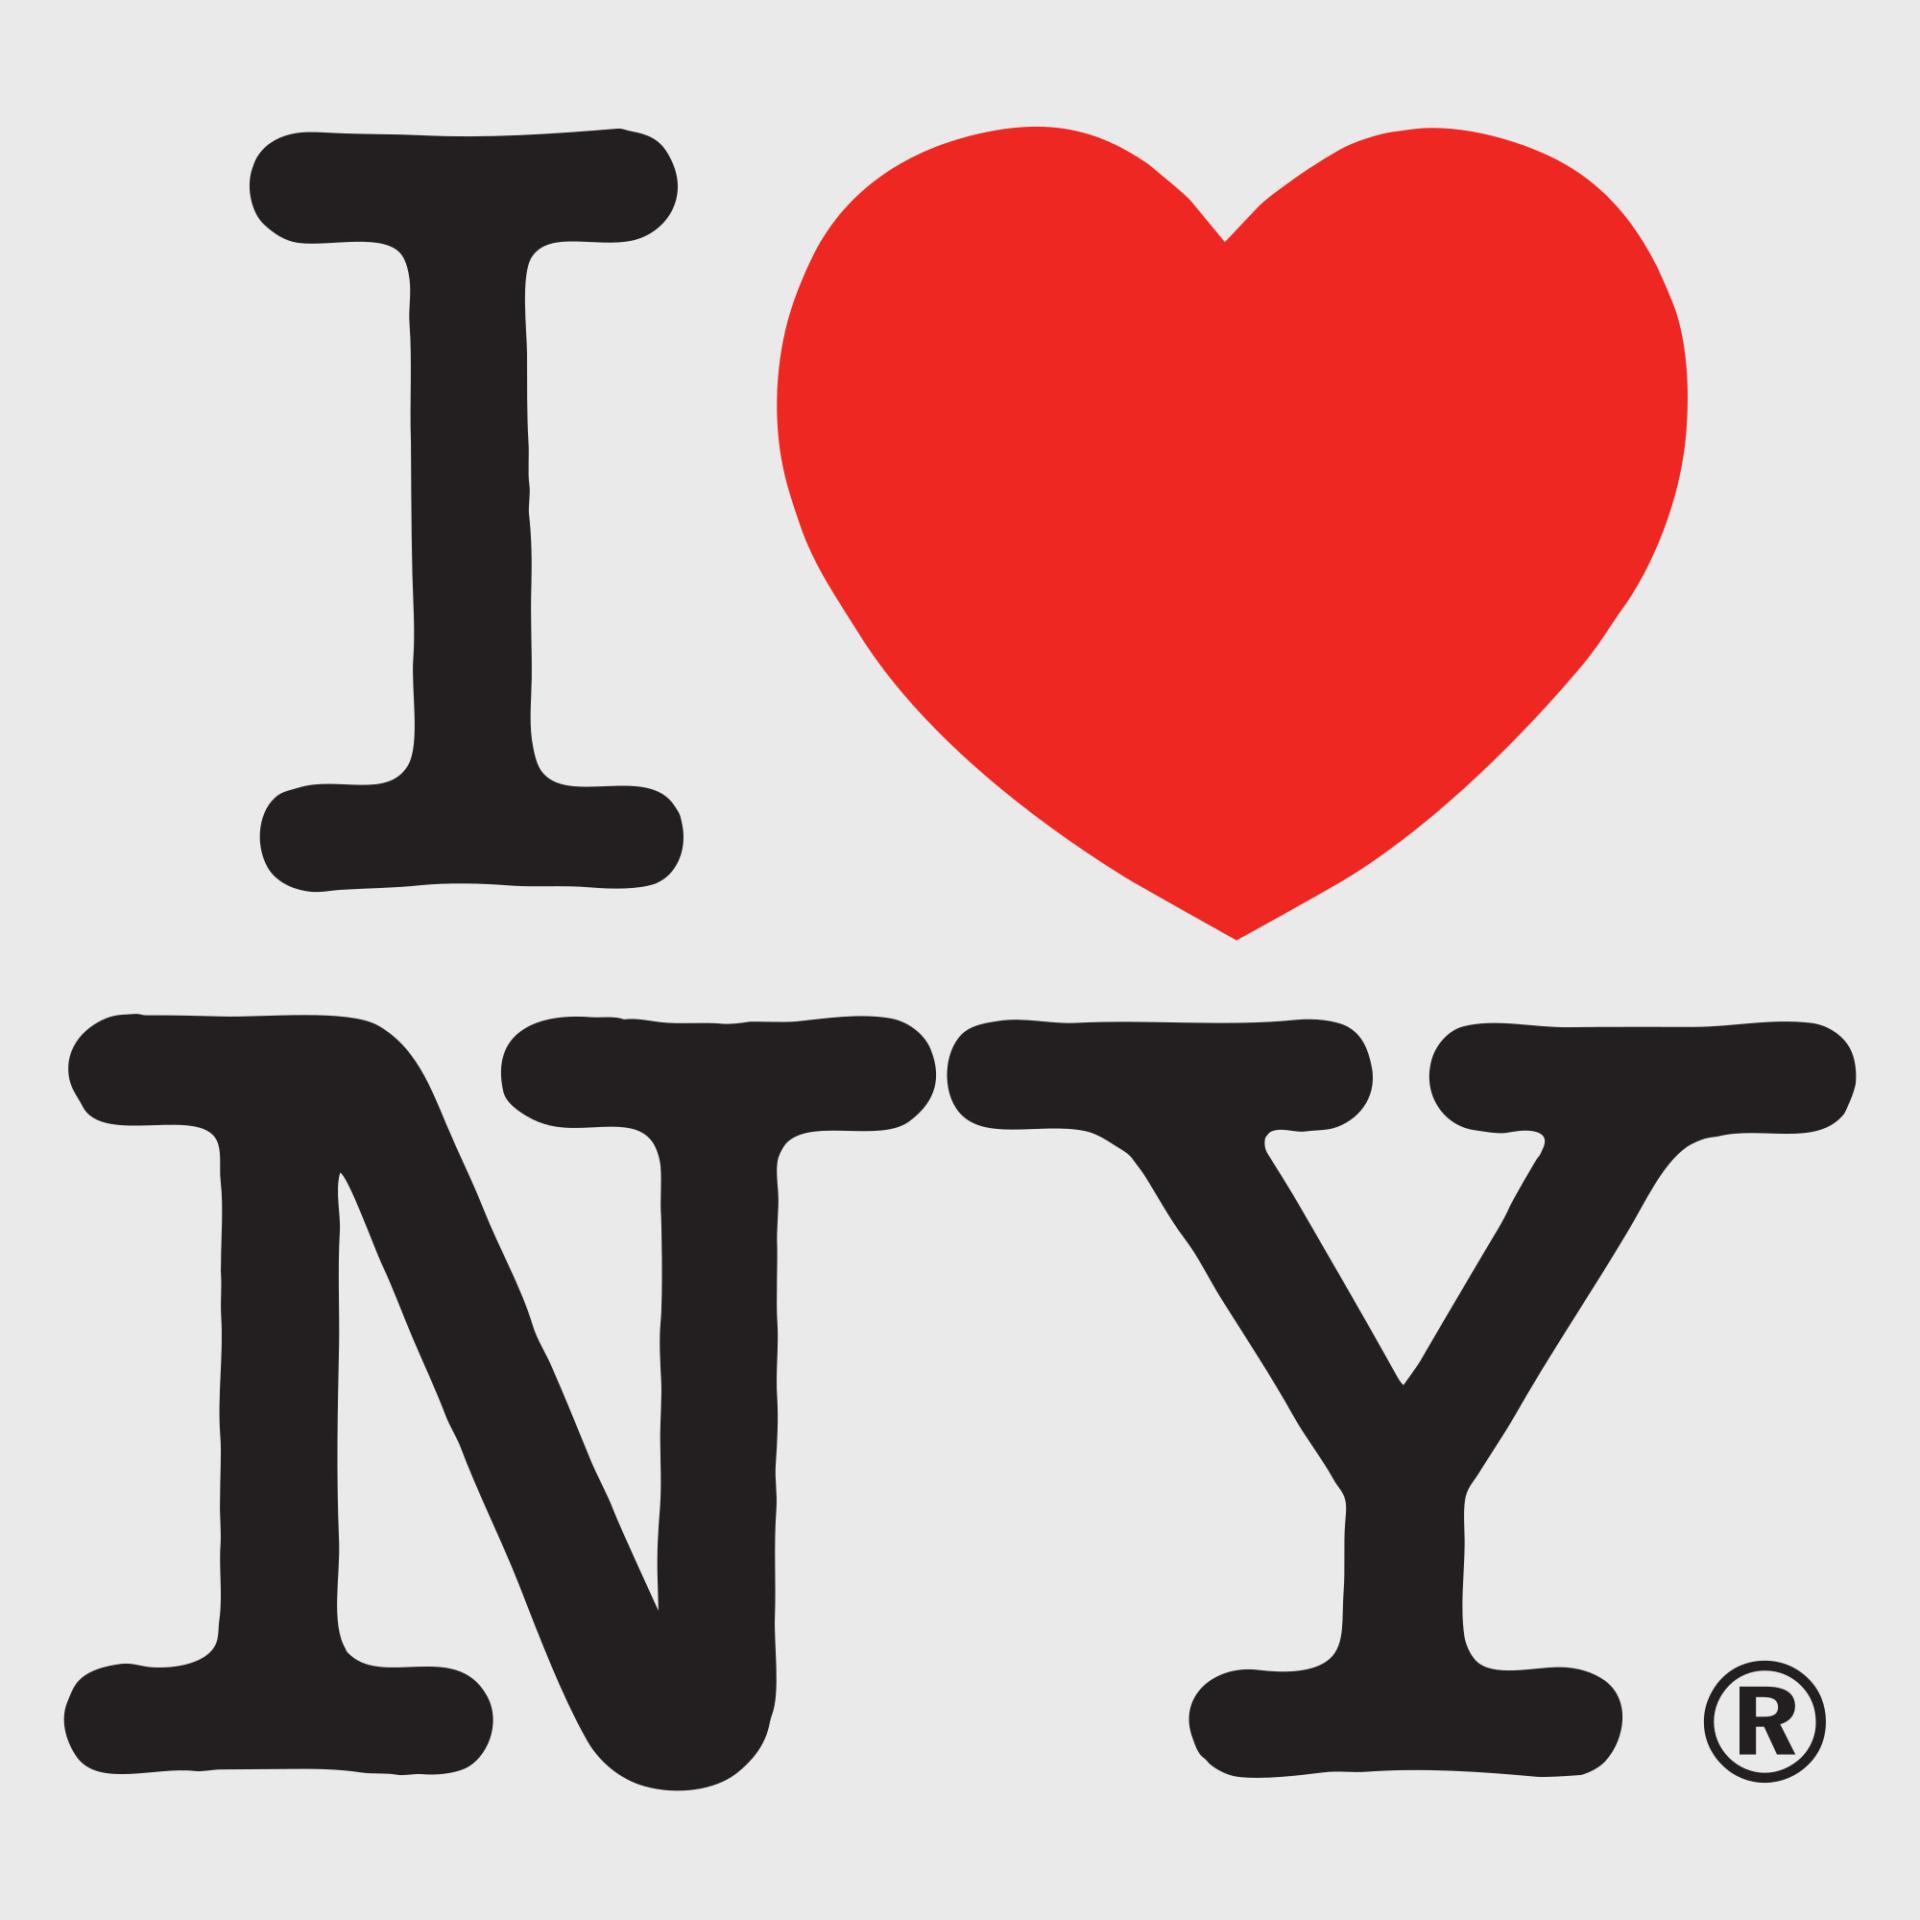 I-heart-New-York-Milton-Glaser-peach-wien